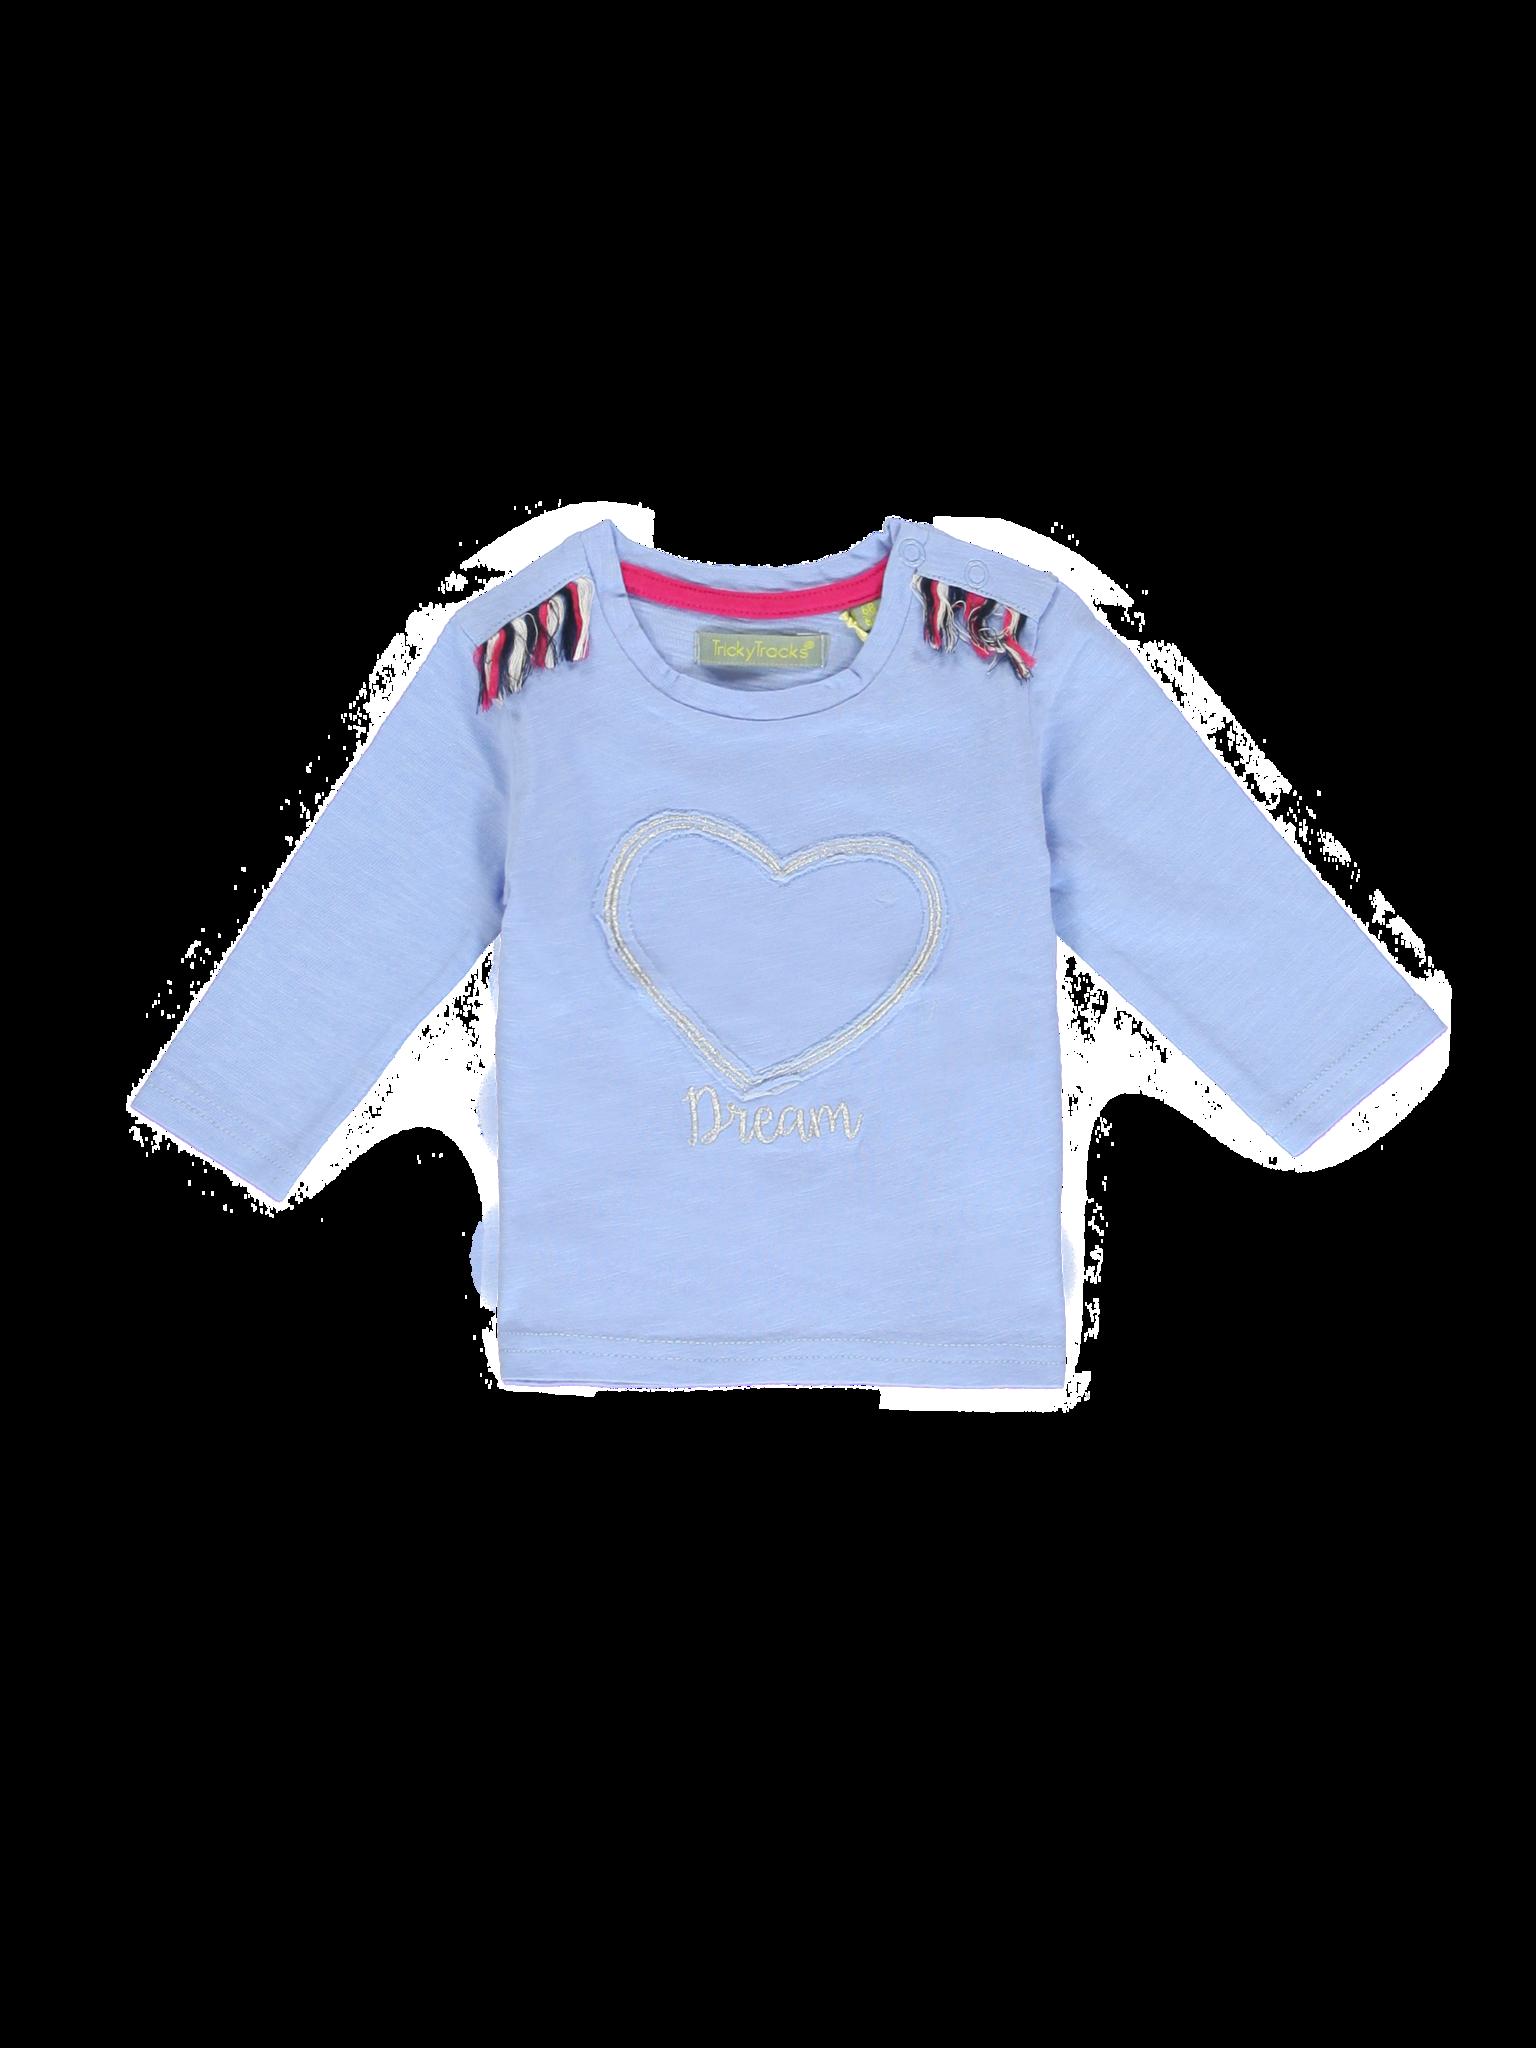 All Brands | Winterproducts Baby | T-shirt | 24 pcs/box